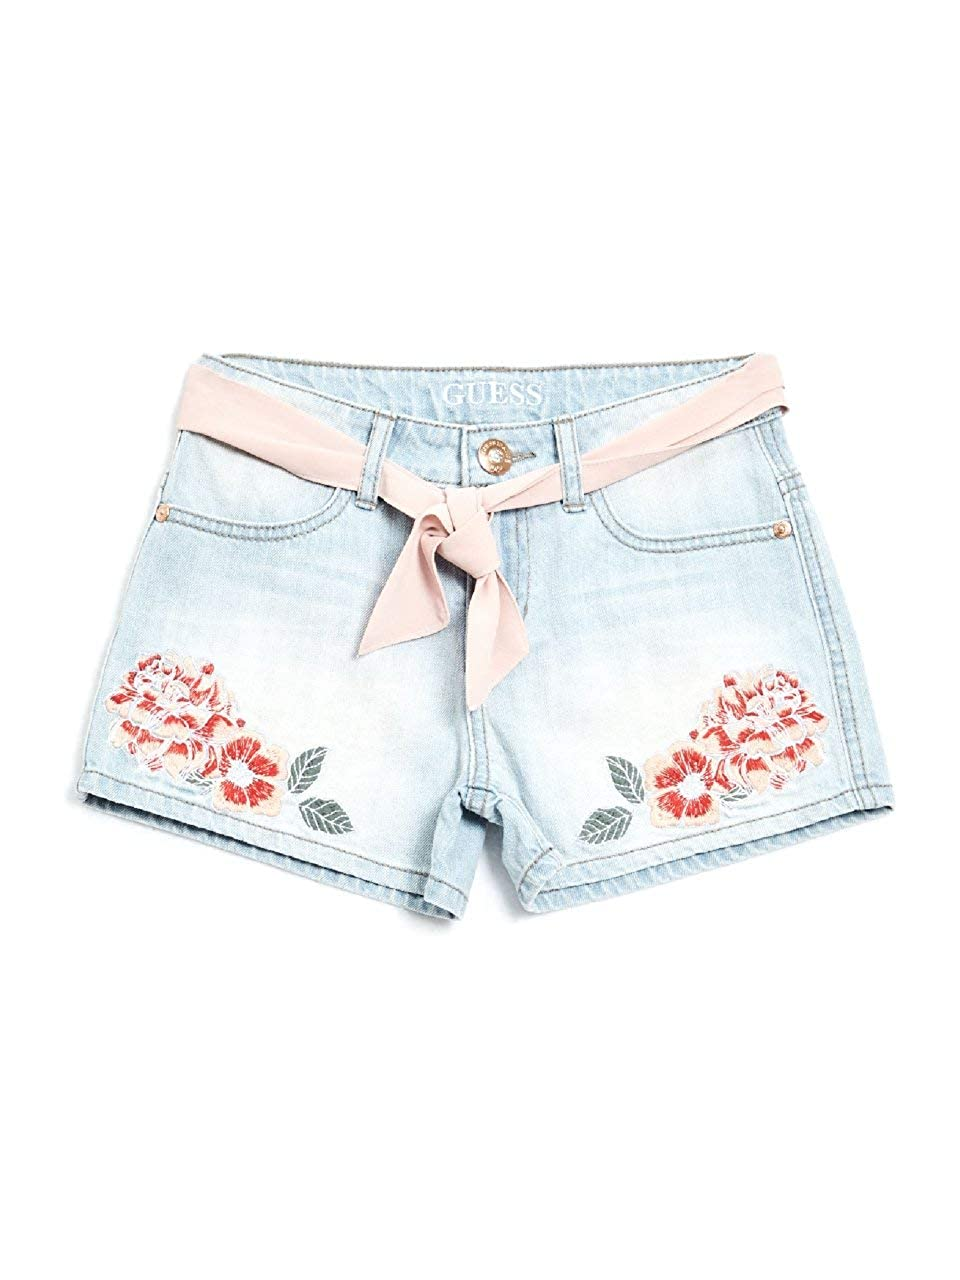 7-16 GUESS Factory Kids Girls Hazel Embroidered Denim Shorts